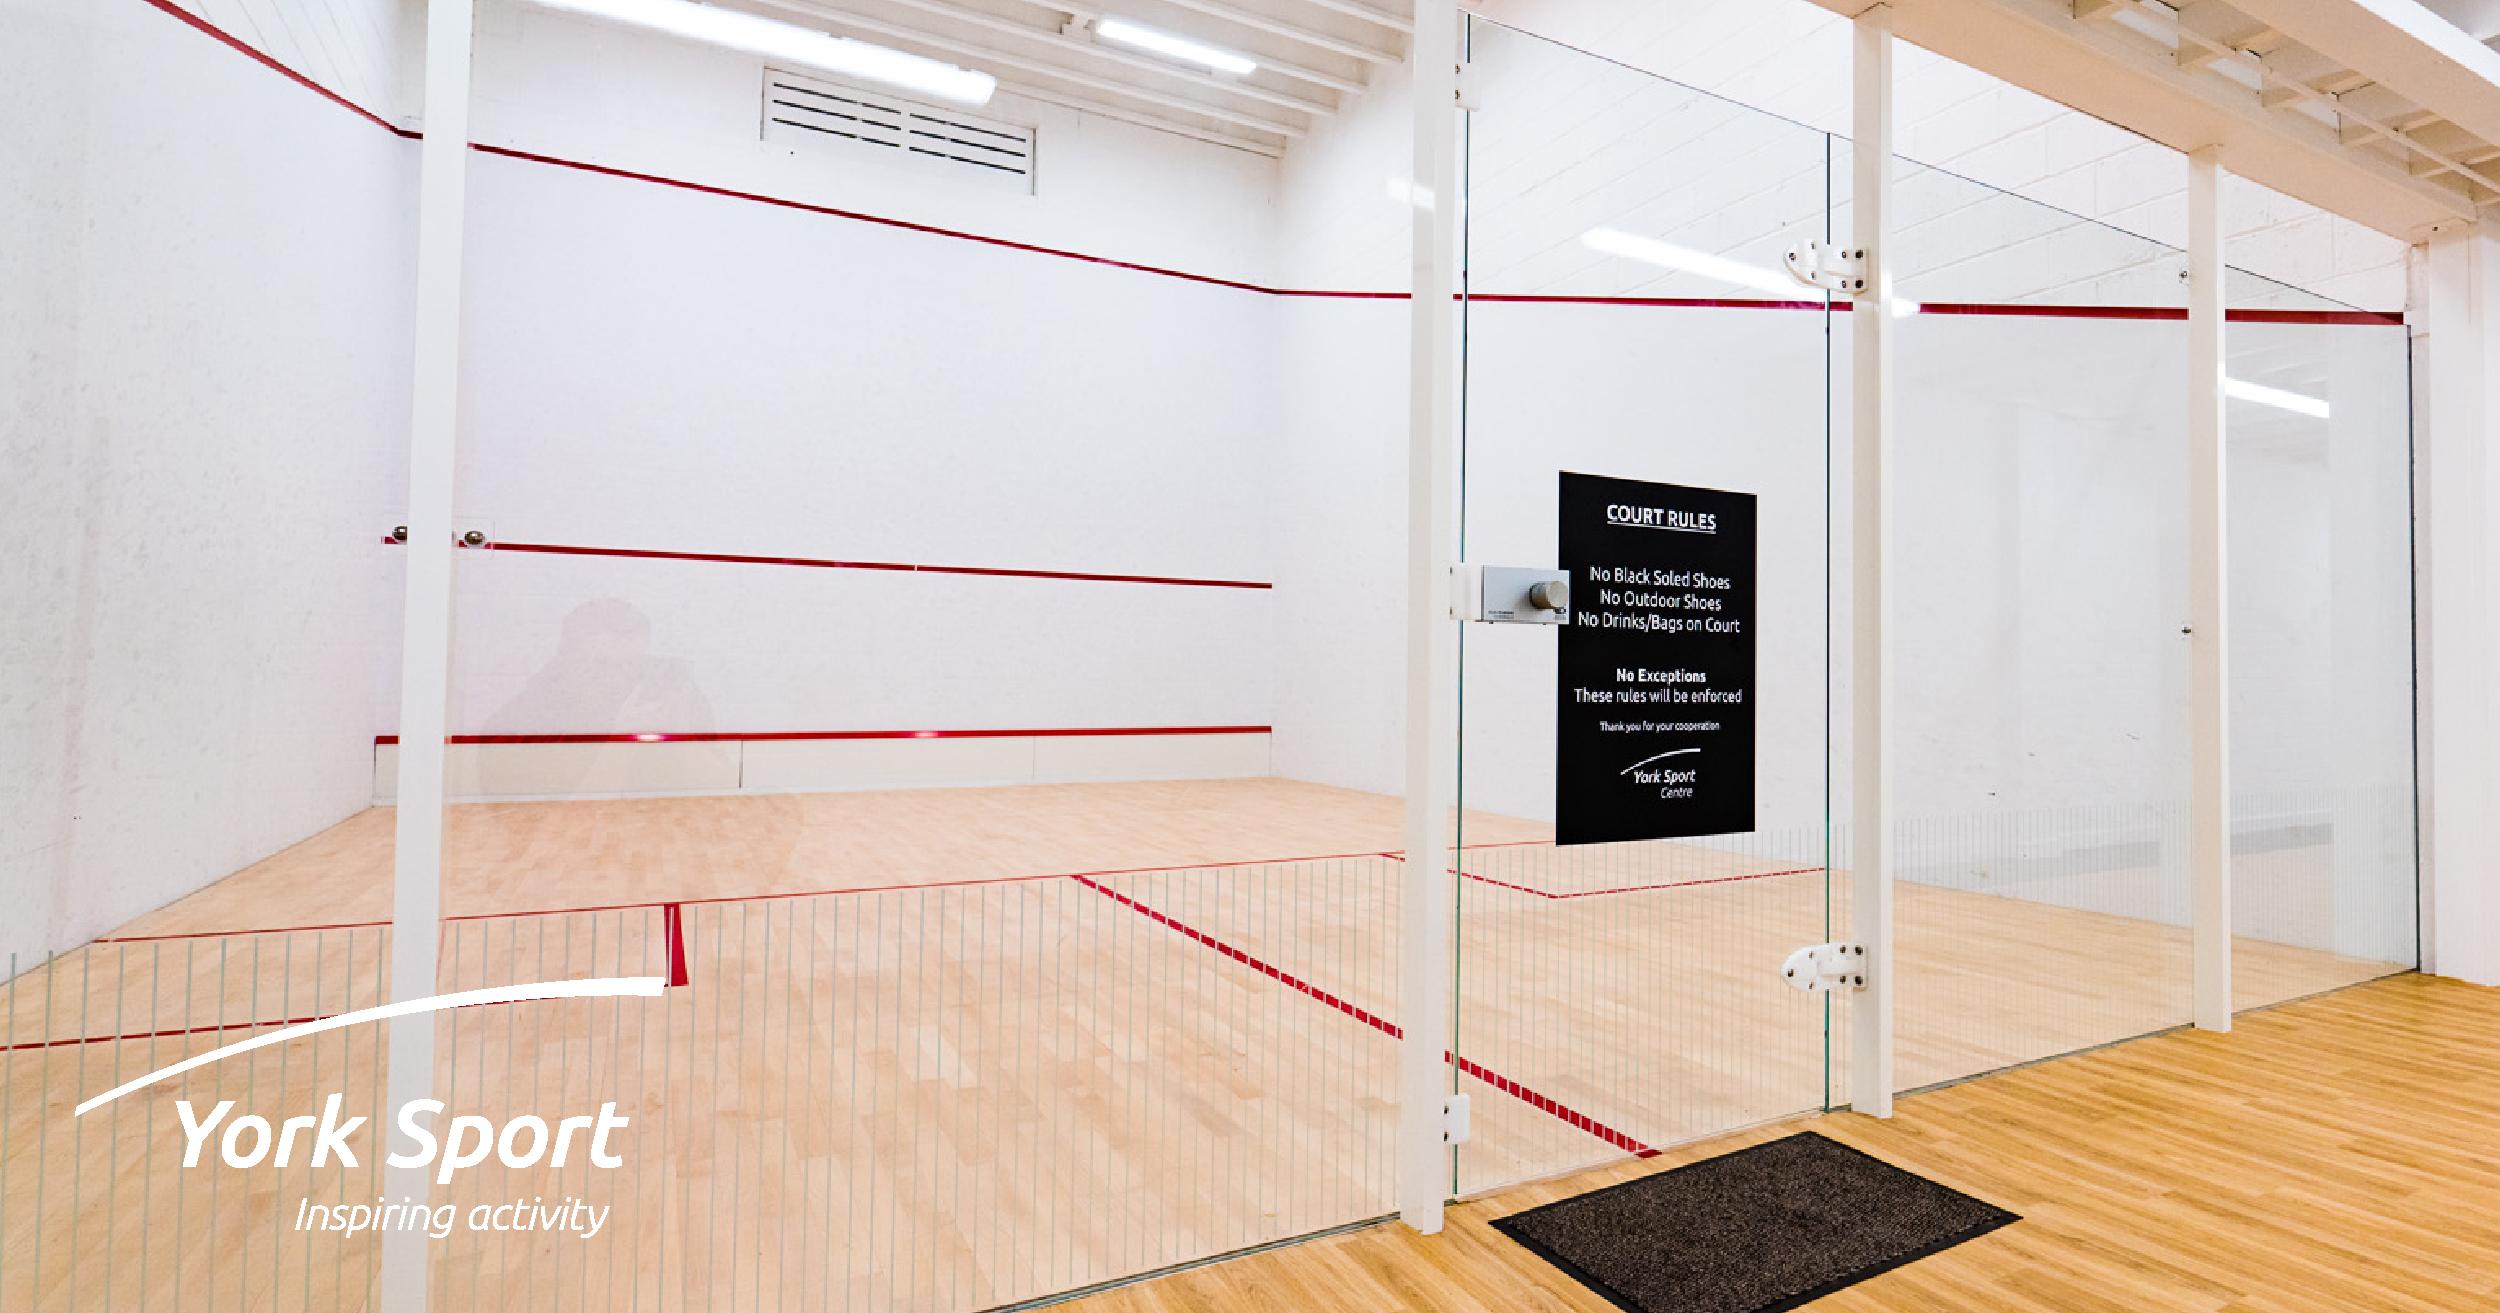 Squash match uk dating